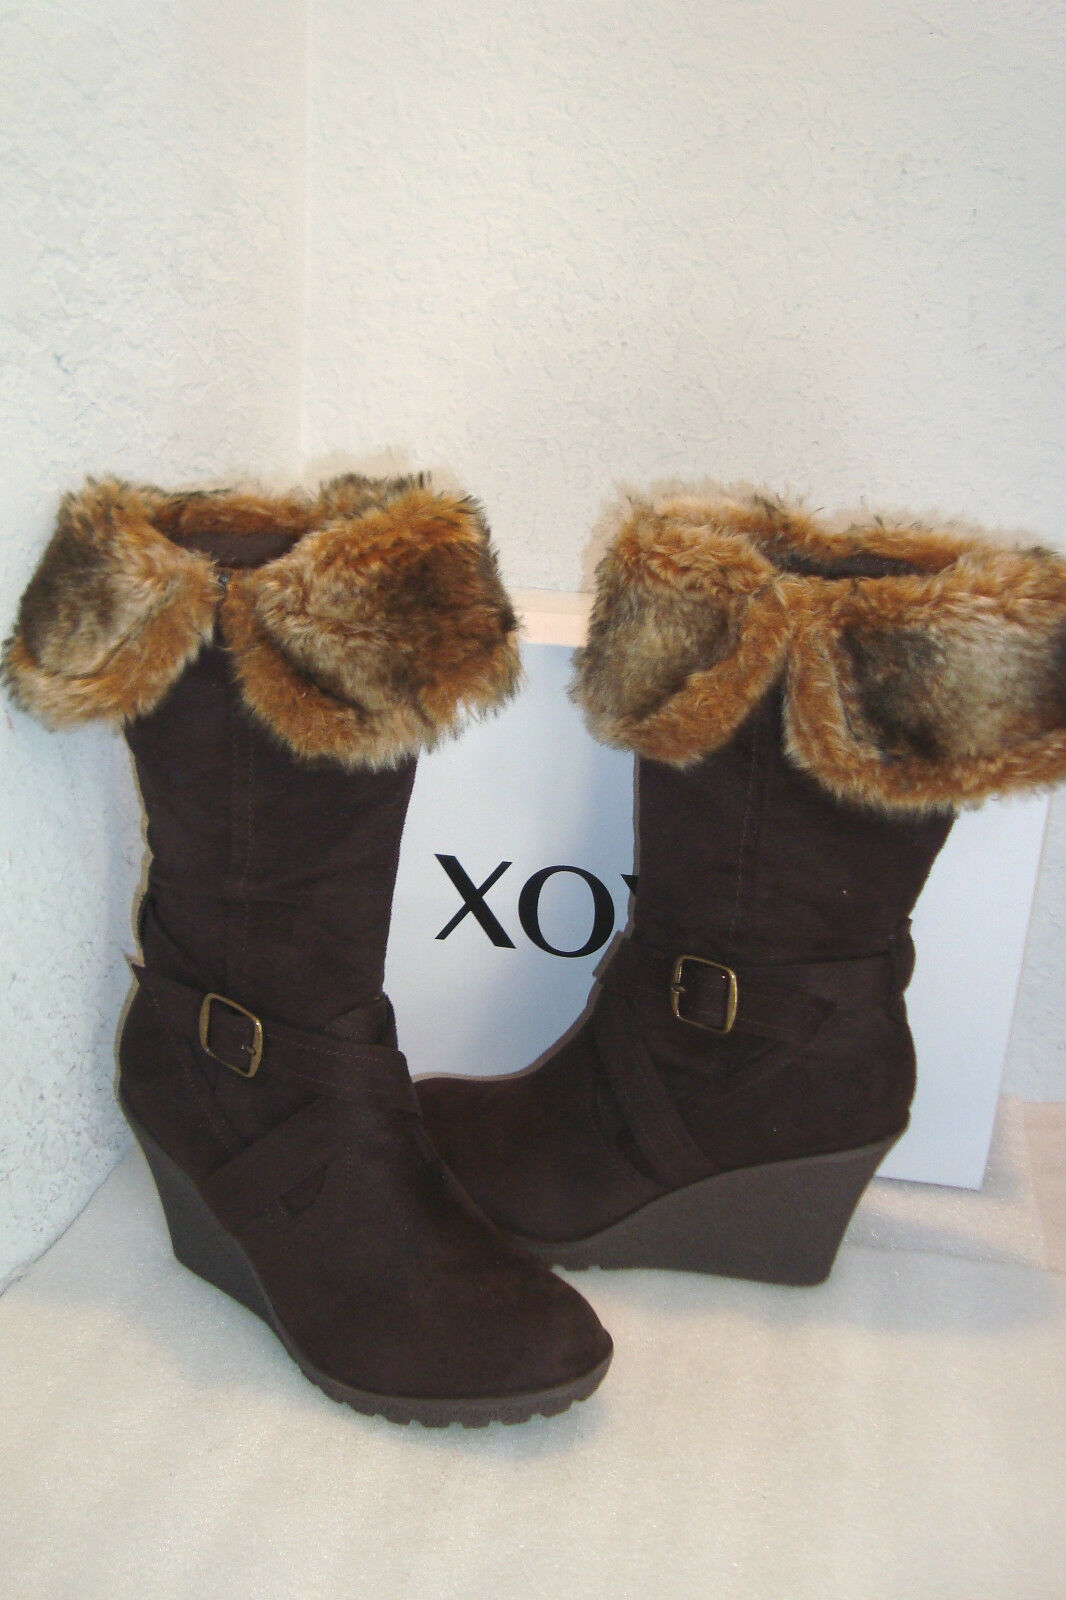 XOXO Footwear NWB Olivia Braun Stiefel Schuhes 8 MED NEW